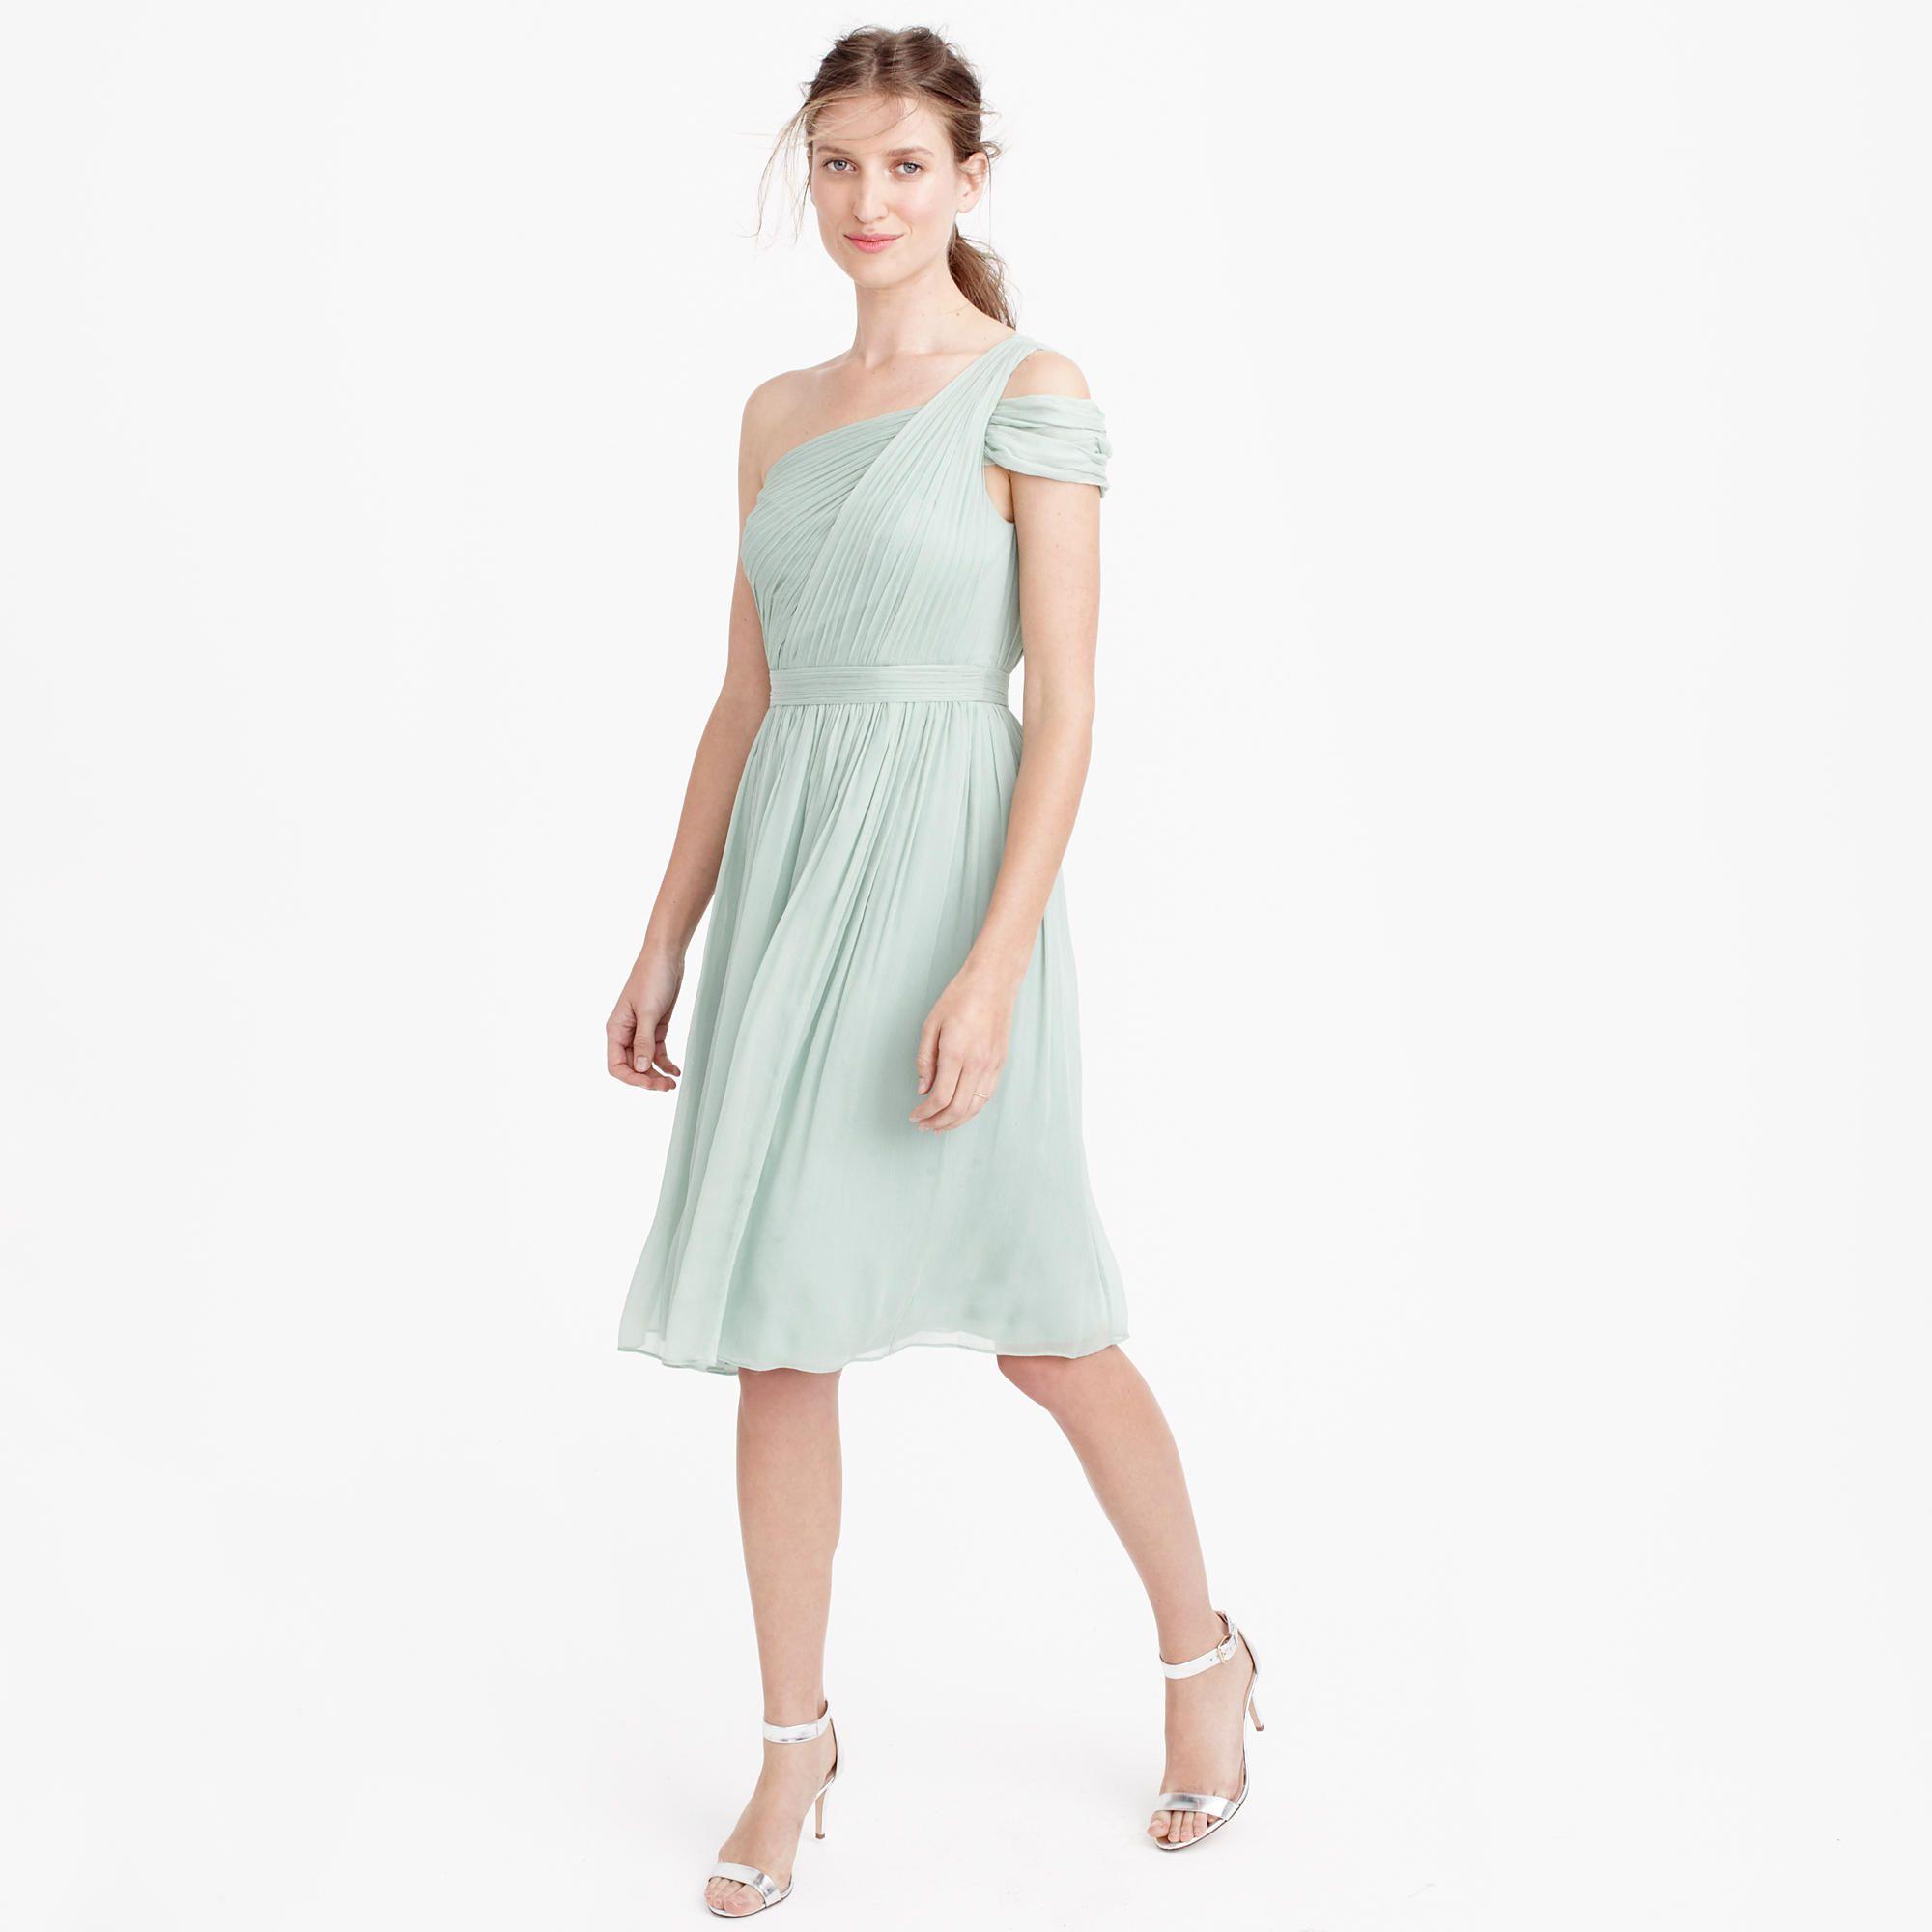 Cara dress in silk chiffon silk chiffon jew bridesmaid cara dress in silk chiffon silk chiffon jew wedding bridesmaid ombrellifo Choice Image